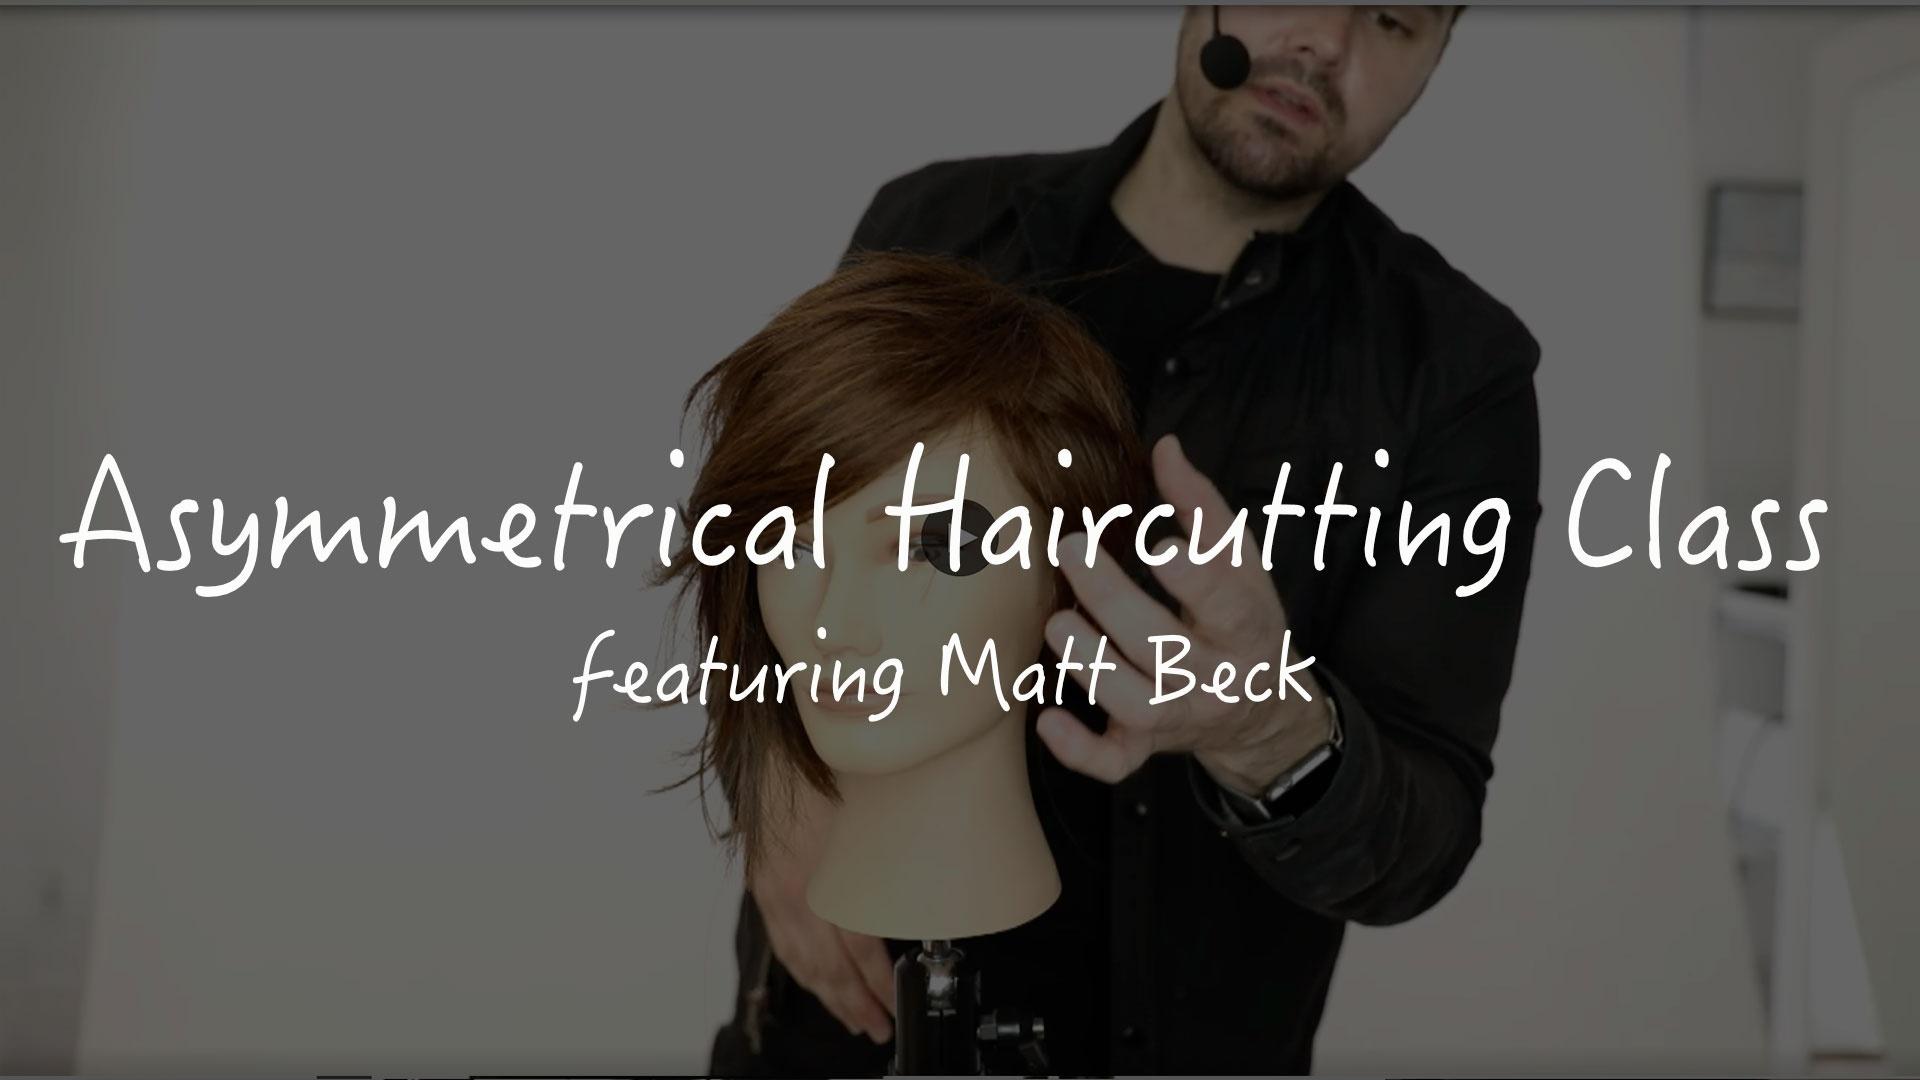 Cueytyqwse6lkhcccras asymmetrical haircutting class